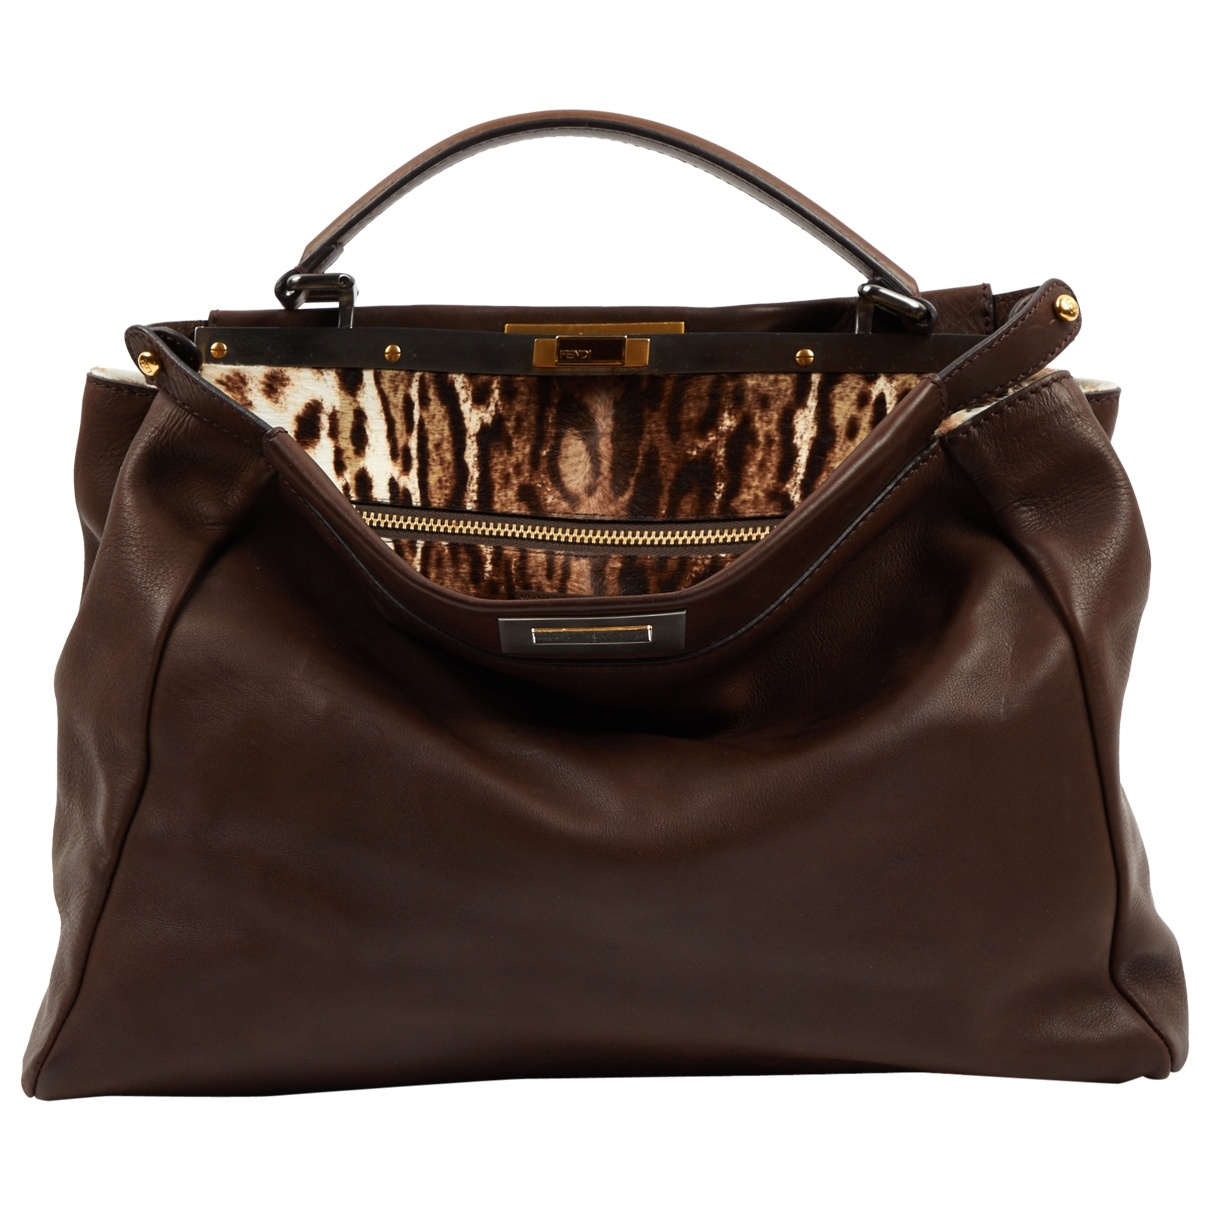 Fendi Peekaboo Handtasche in  Braun Leder